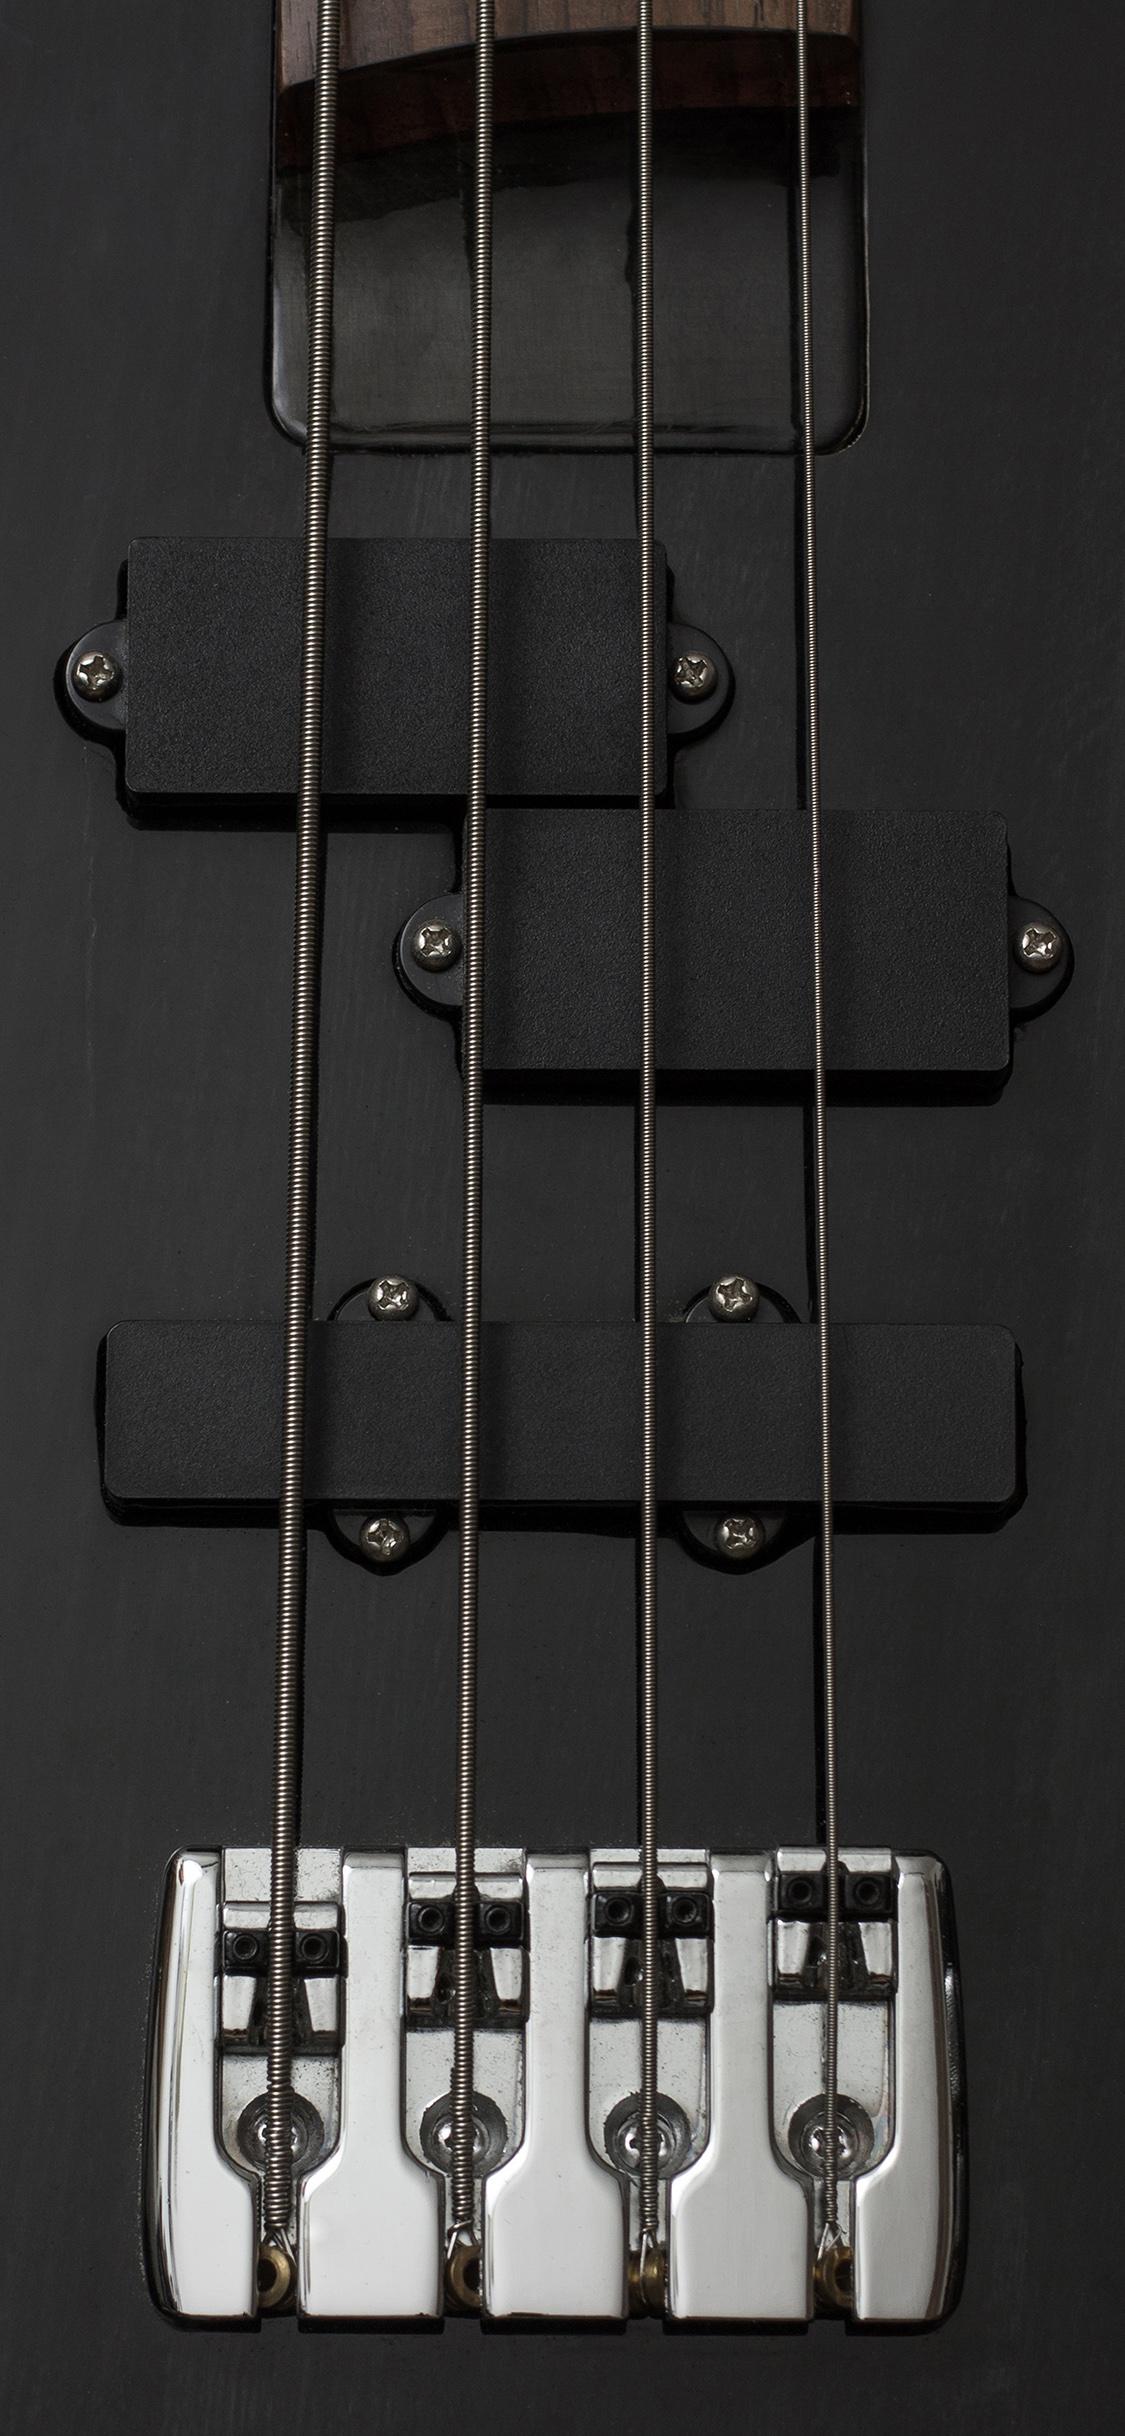 Au91 Guitar Bass Electric Music Dark Black Illustration Art Wallpaper